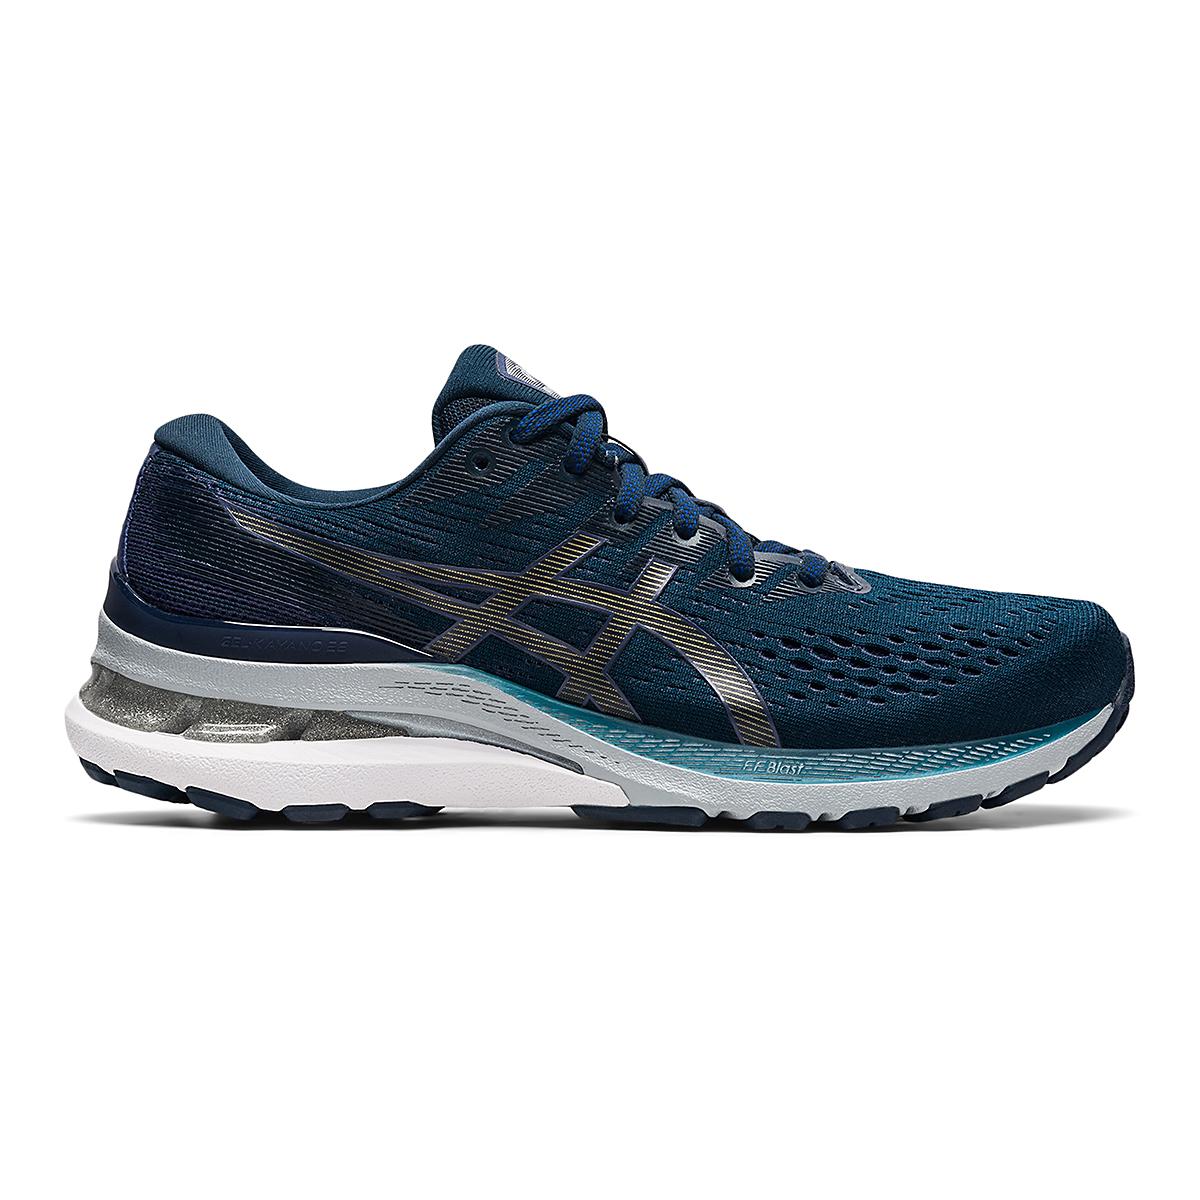 Women's Asics Gel-Kayano 28 Running Shoe - Color: French Blue/Thunder Blue - Size: 5 - Width: Wide, French Blue/Thunder Blue, large, image 1